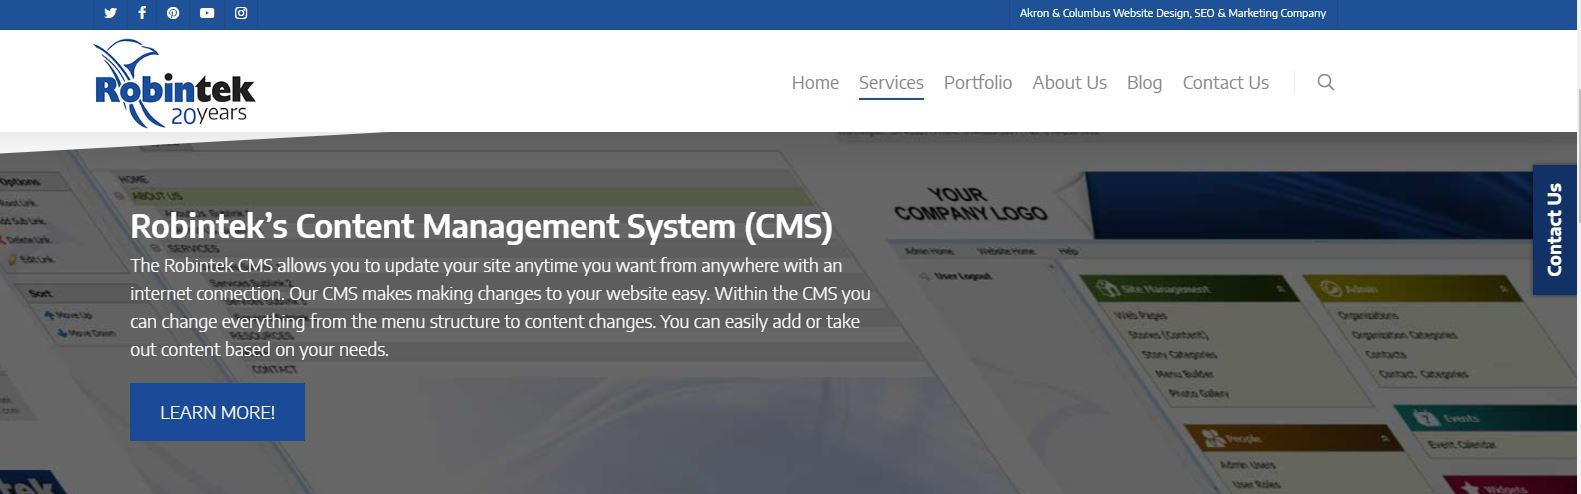 services page robintek